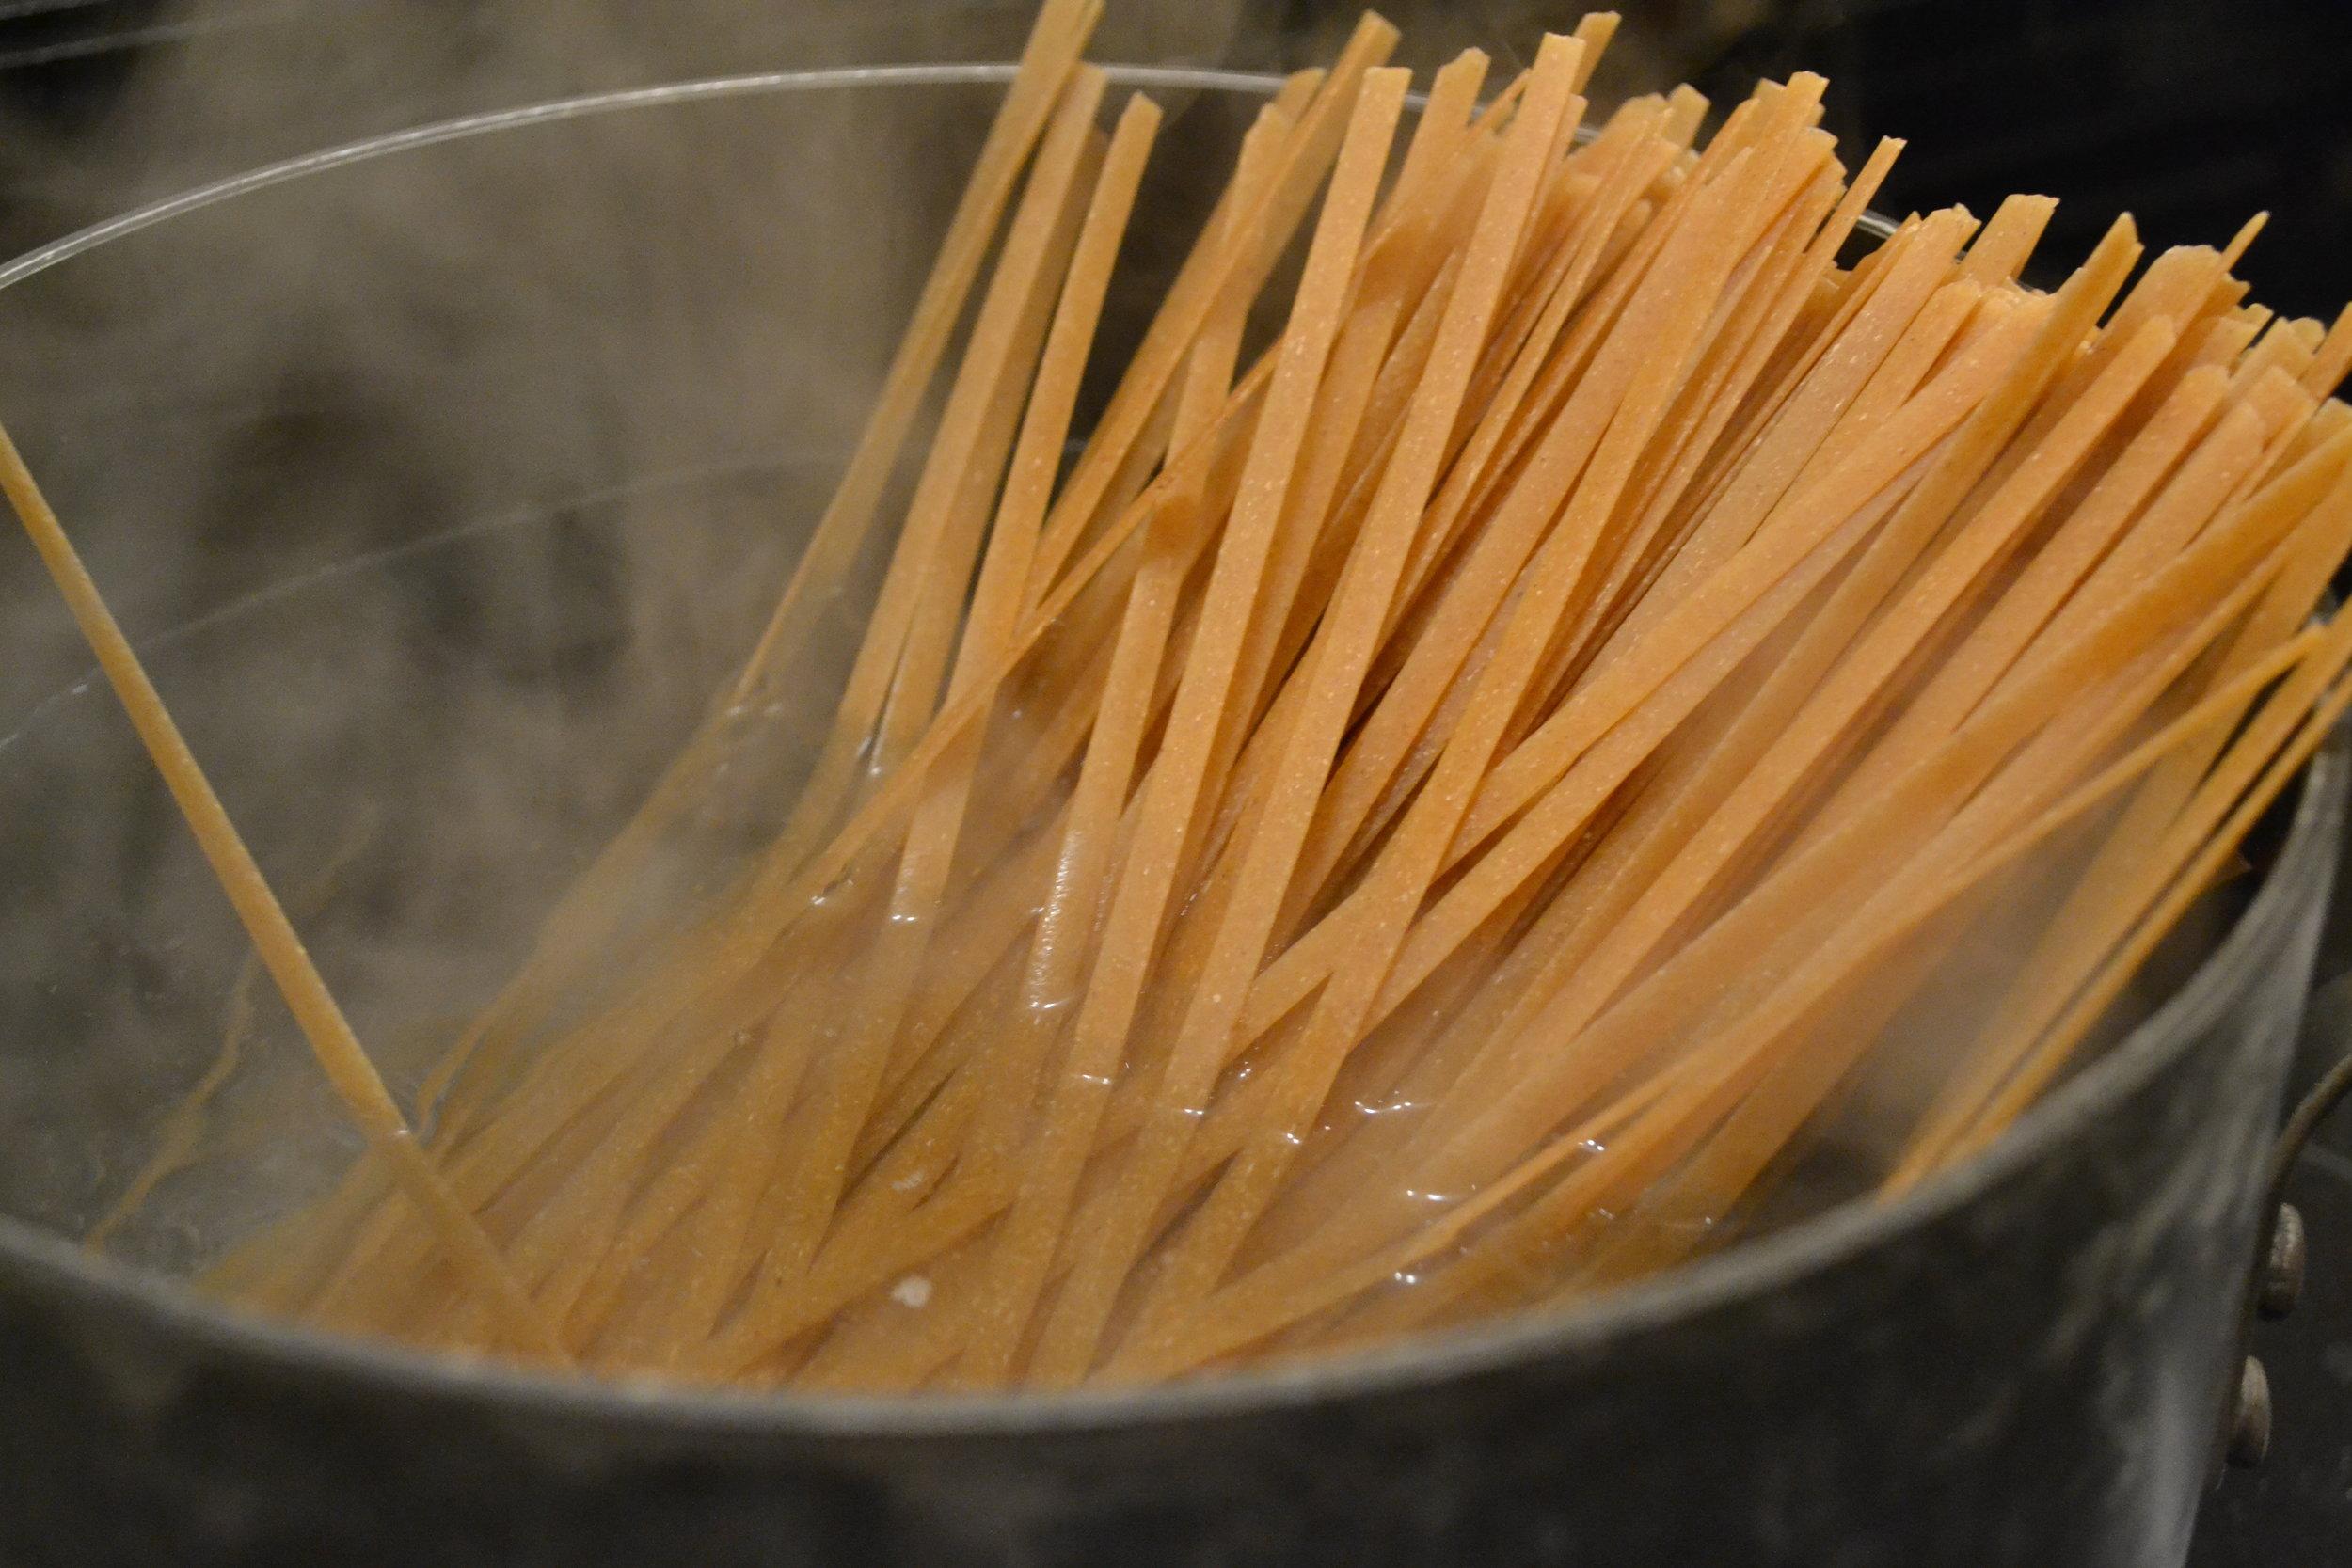 Boiling whole wheat fettuccine